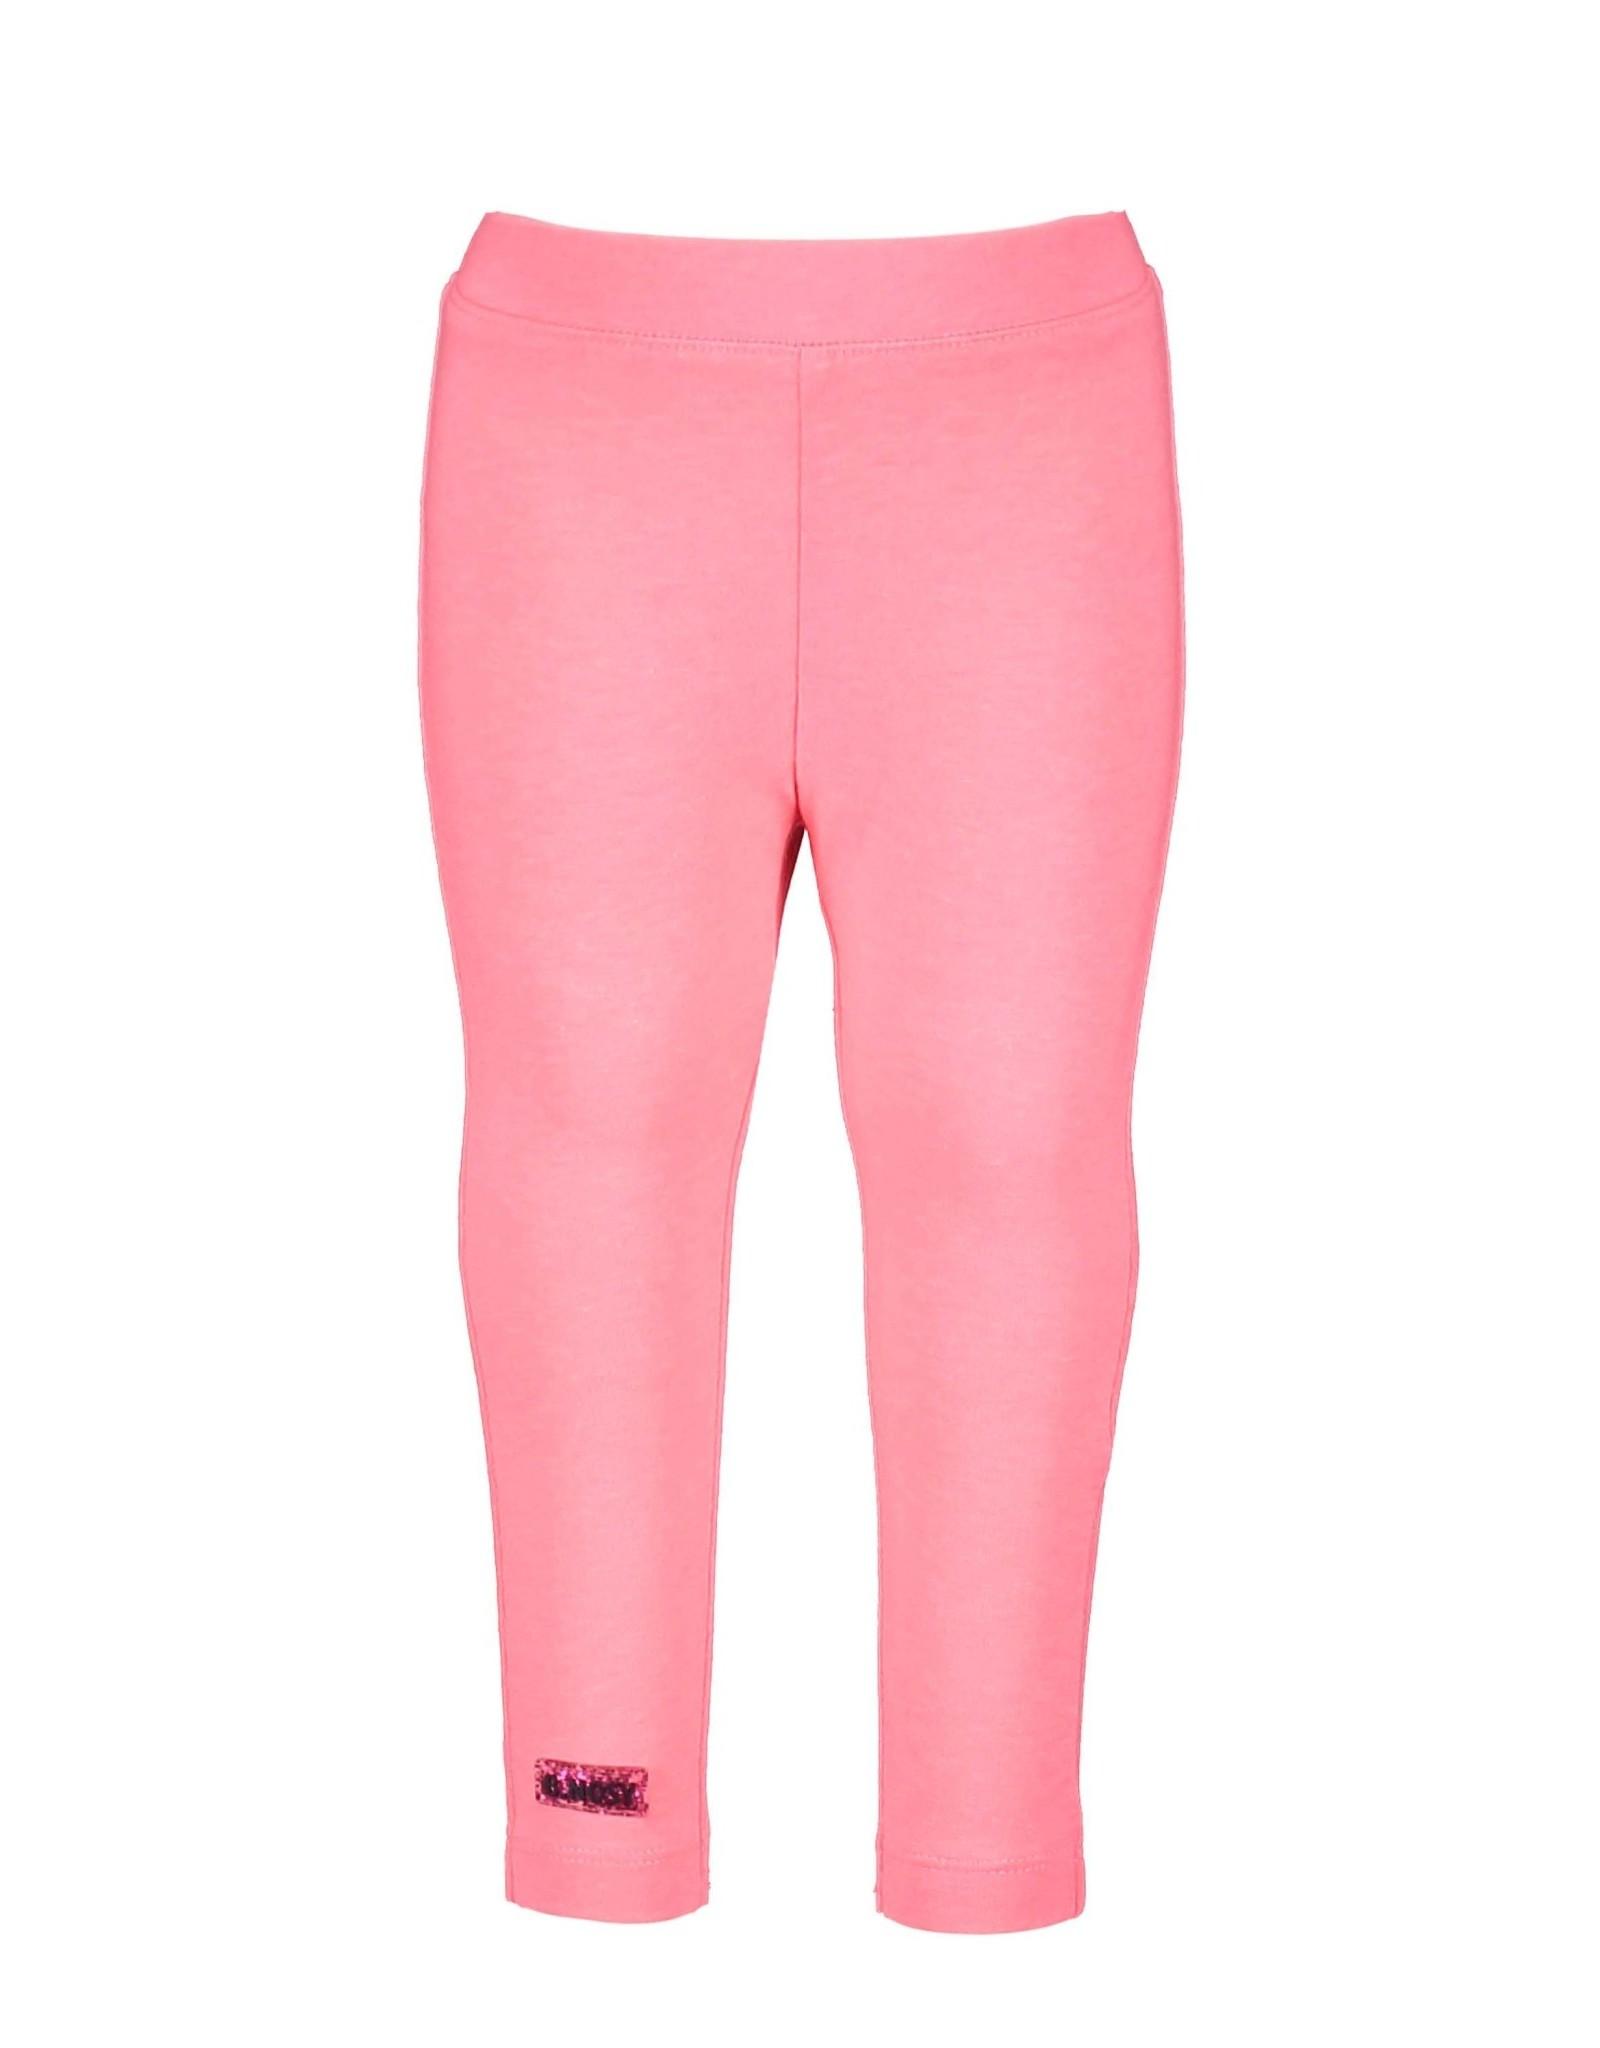 B.Nosy B.Nosy baby meisjes legging Space Festival Pink S21